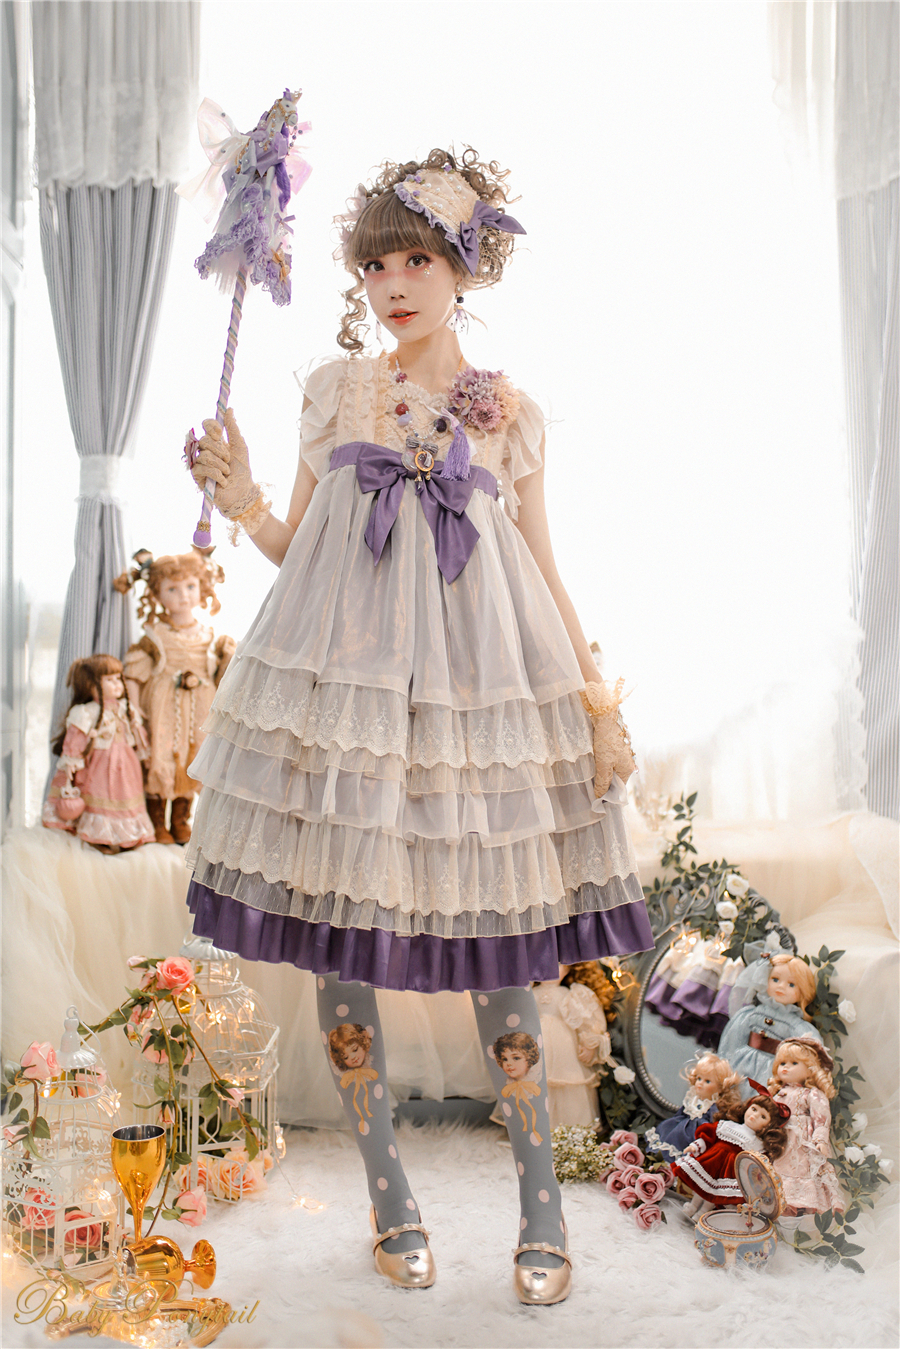 Babyponytail_Model Photo_Present Angel_JSK Violet_2_Kaka_01.jpg